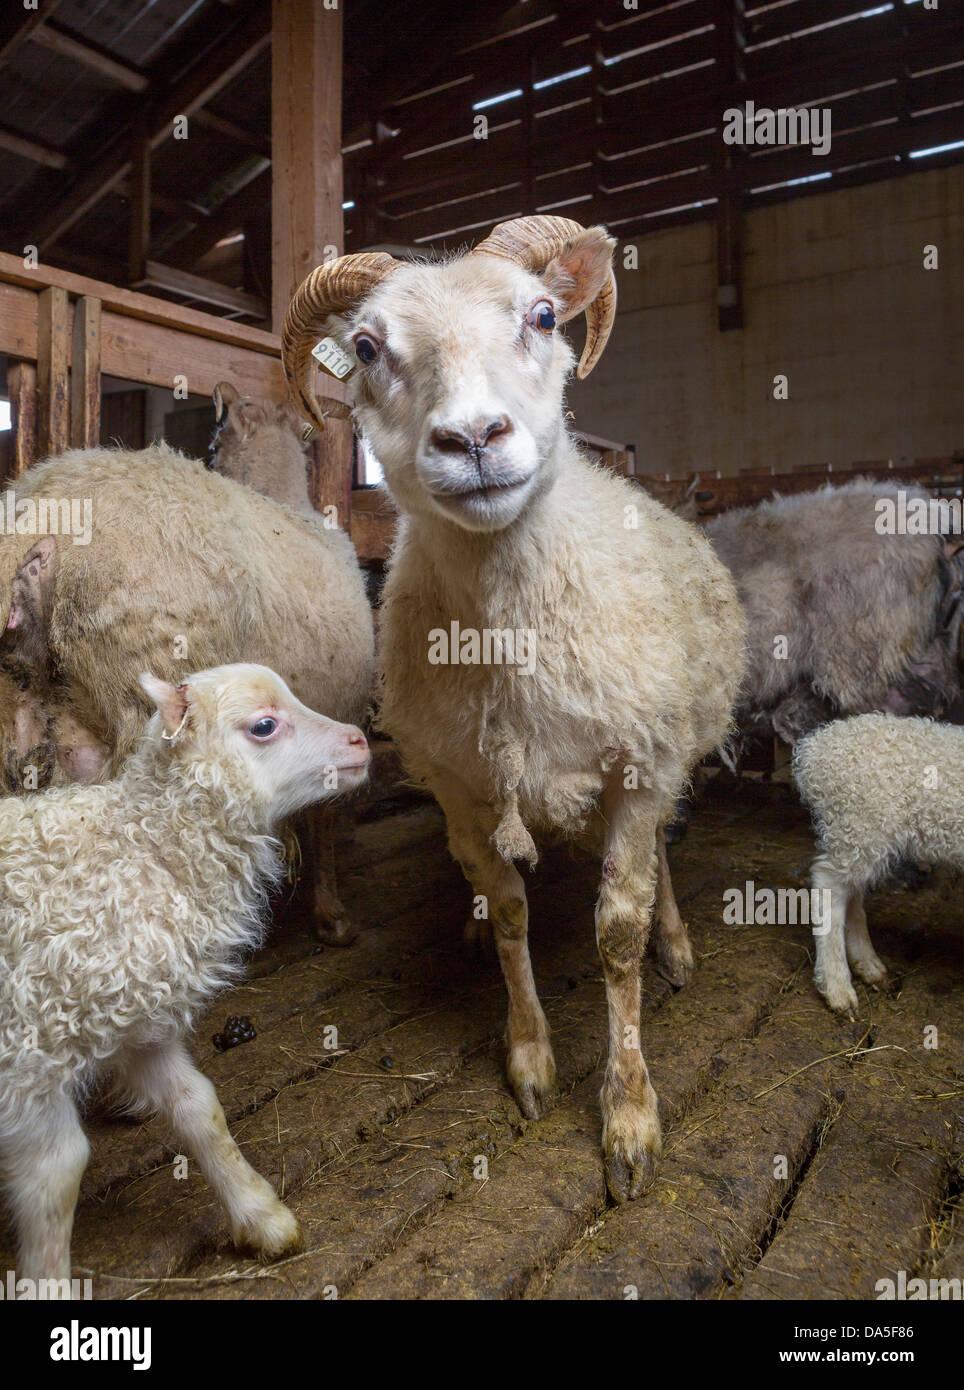 Ewe and lamb inside barn, Iceland - Stock Image